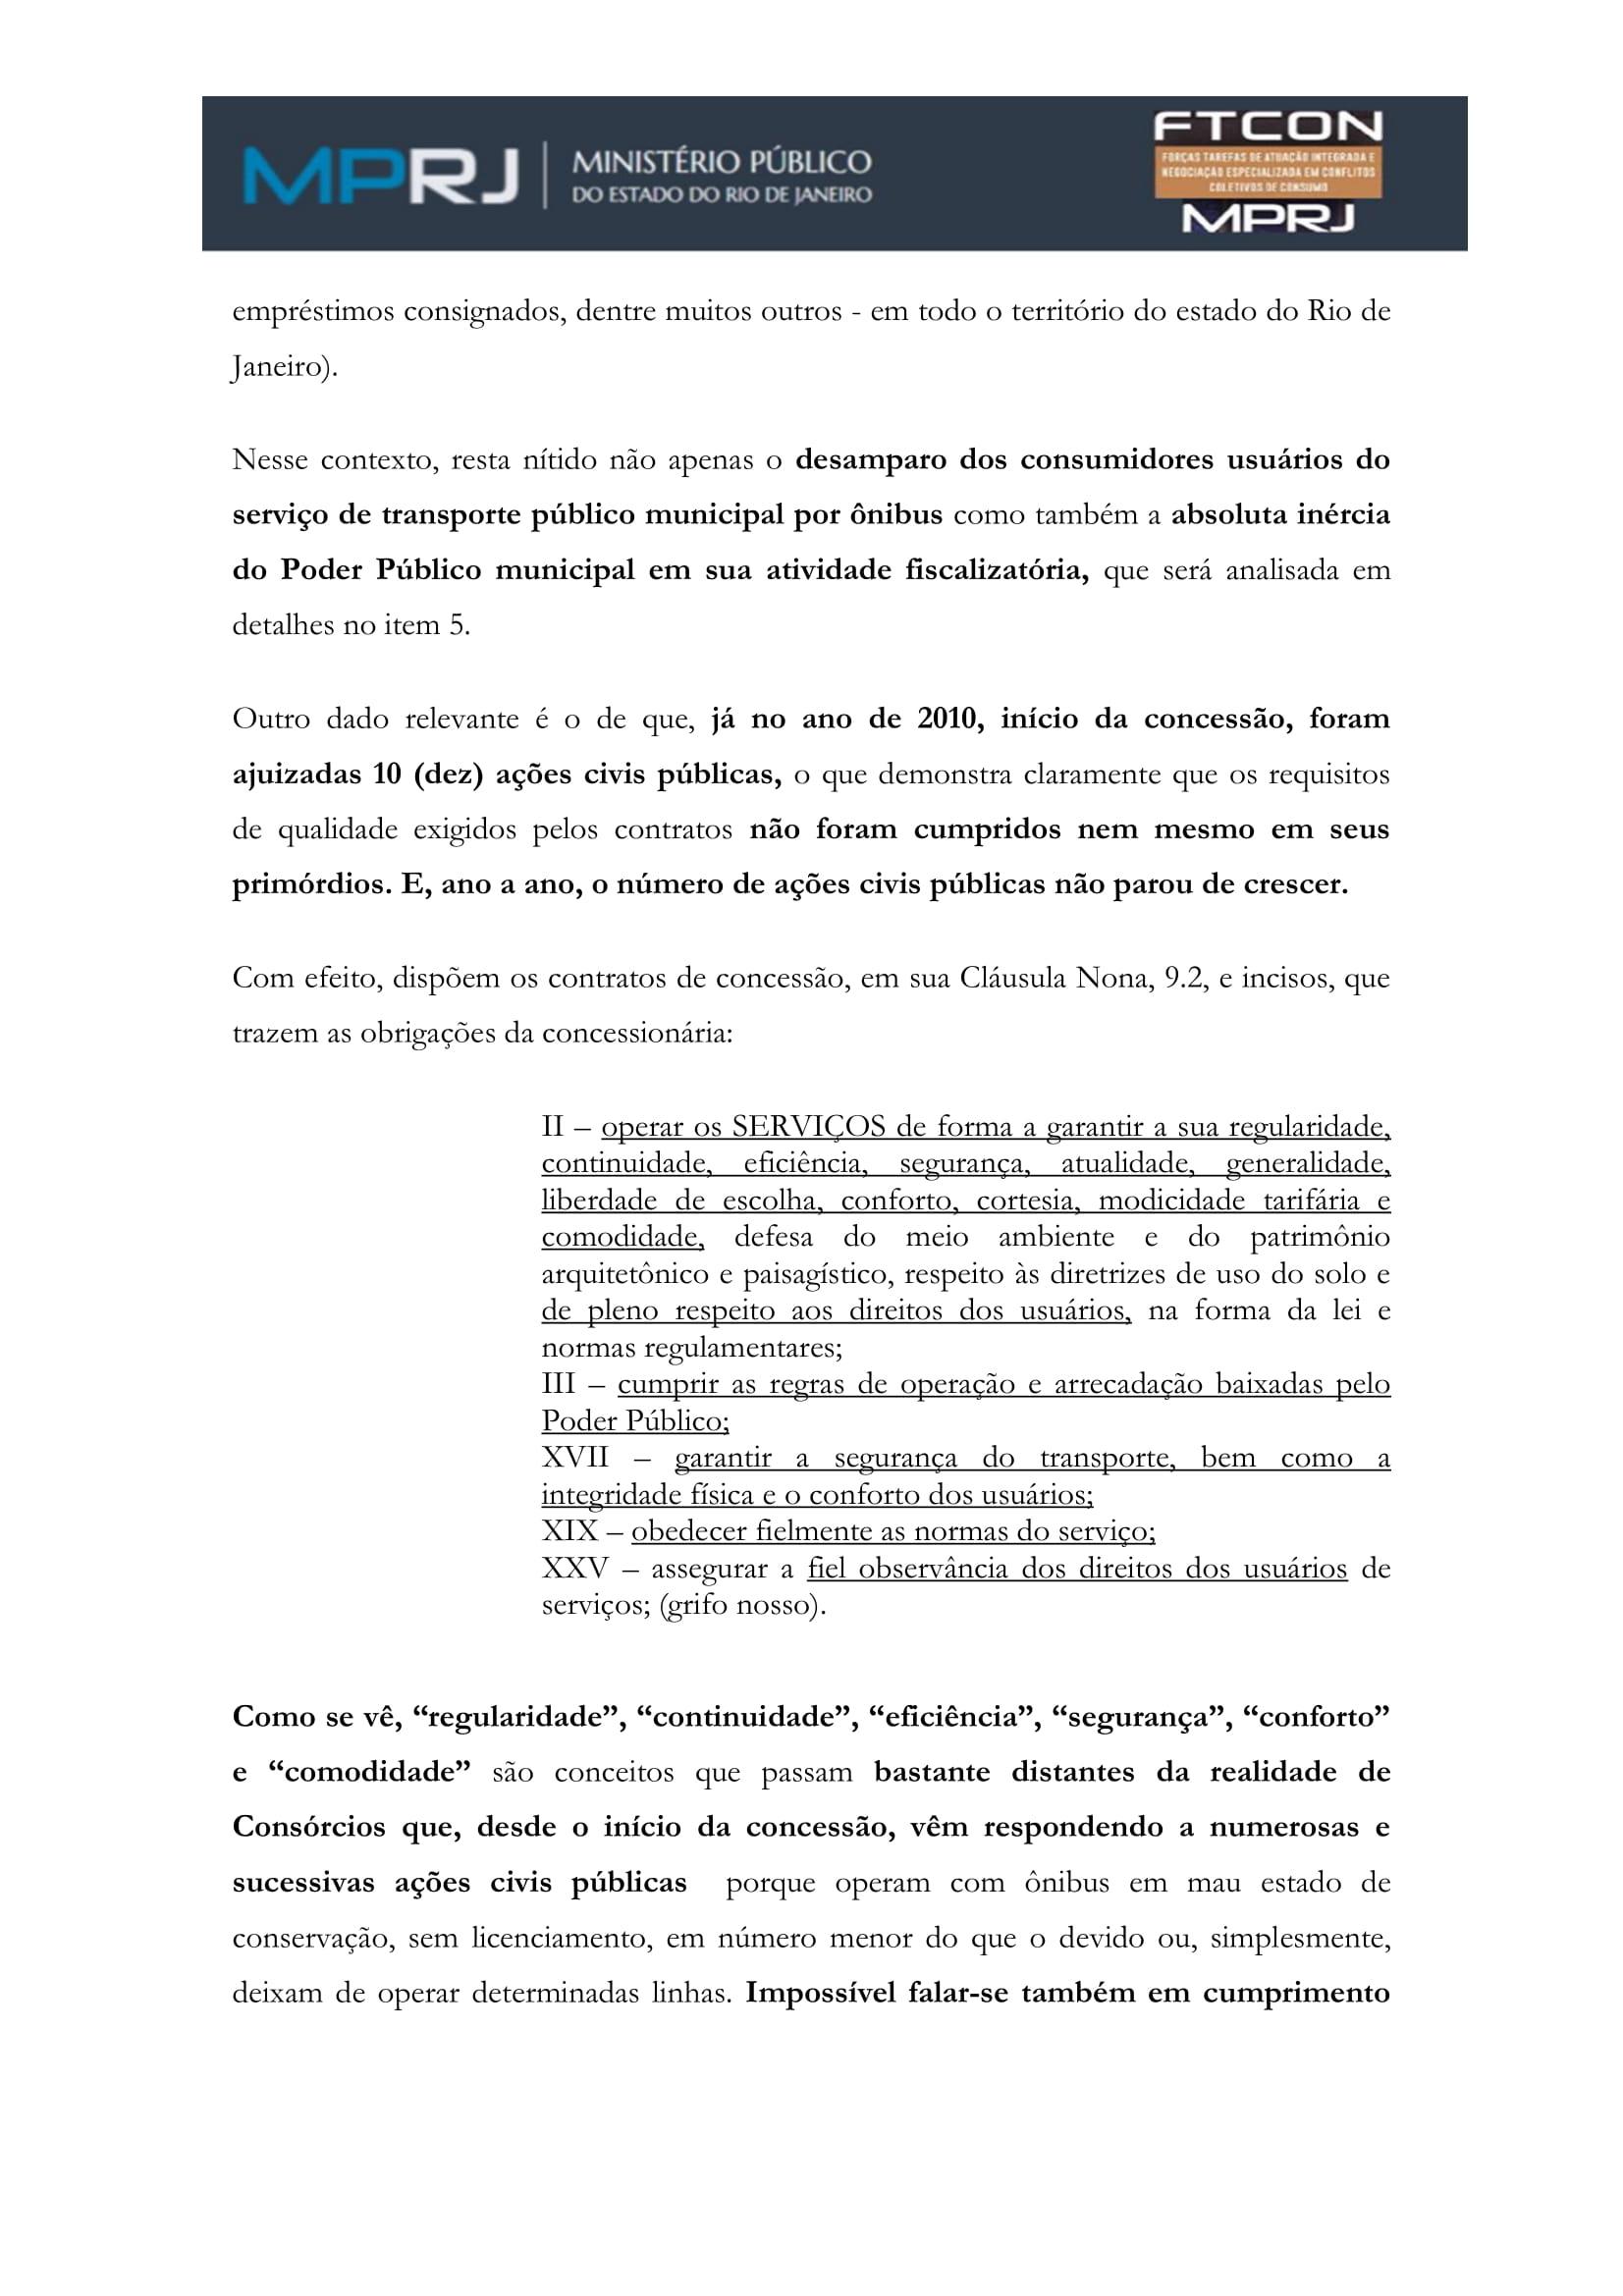 acp_caducidade_onibus_dr_rt-024